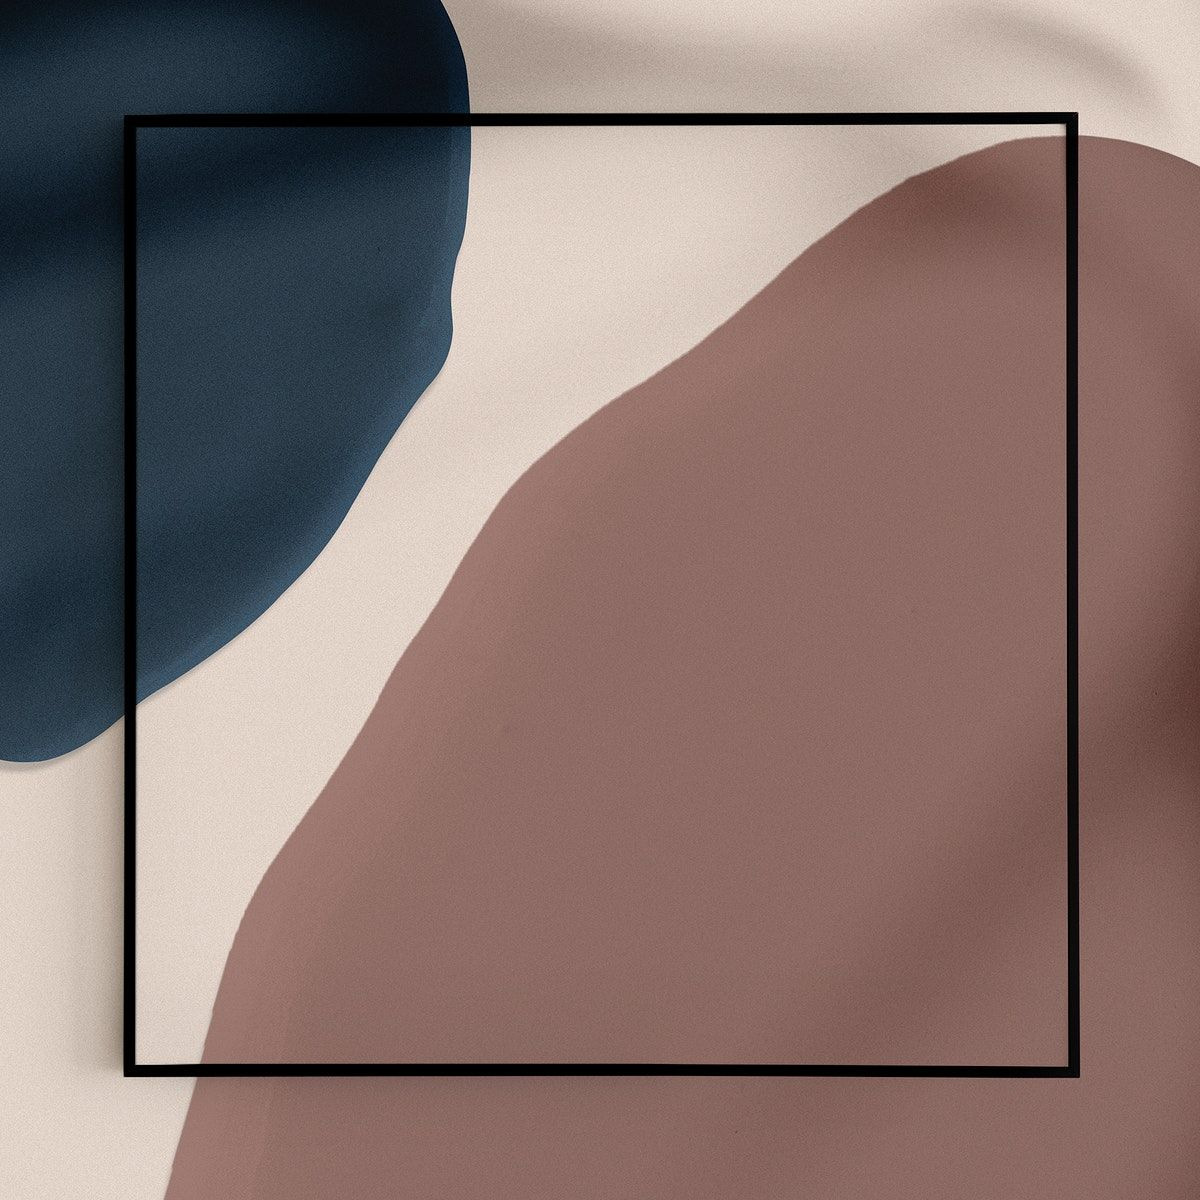 Black Frame Psd Neutral Tone Background Premium Image By Rawpixel Com Sasi Beige Background Background Neutral Tones